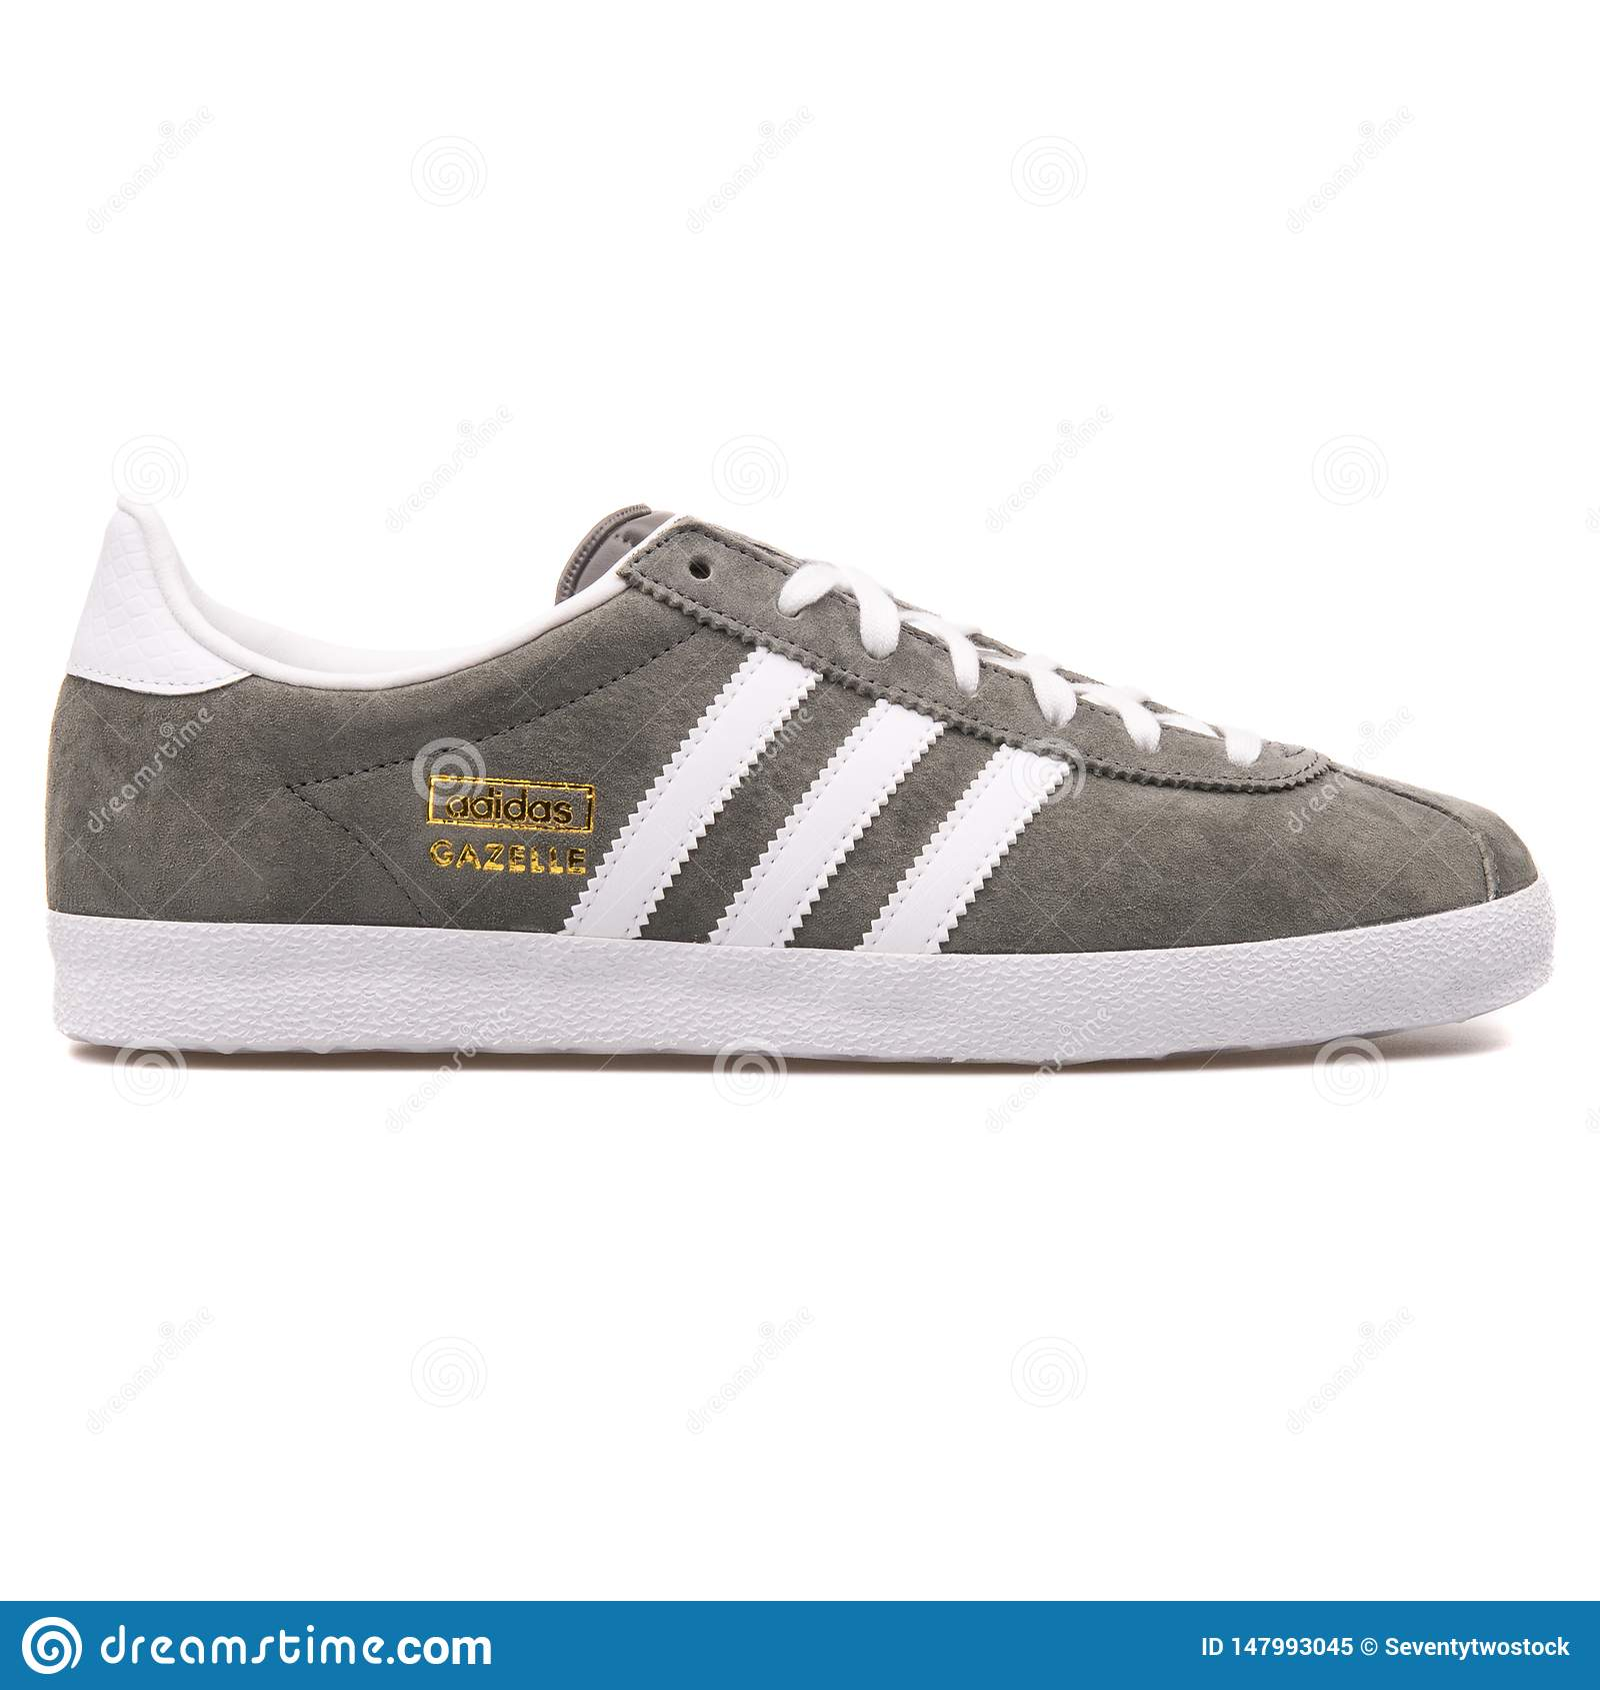 Adidas Gazelle OG Grey And White Sneaker Editorial Image - Image ...